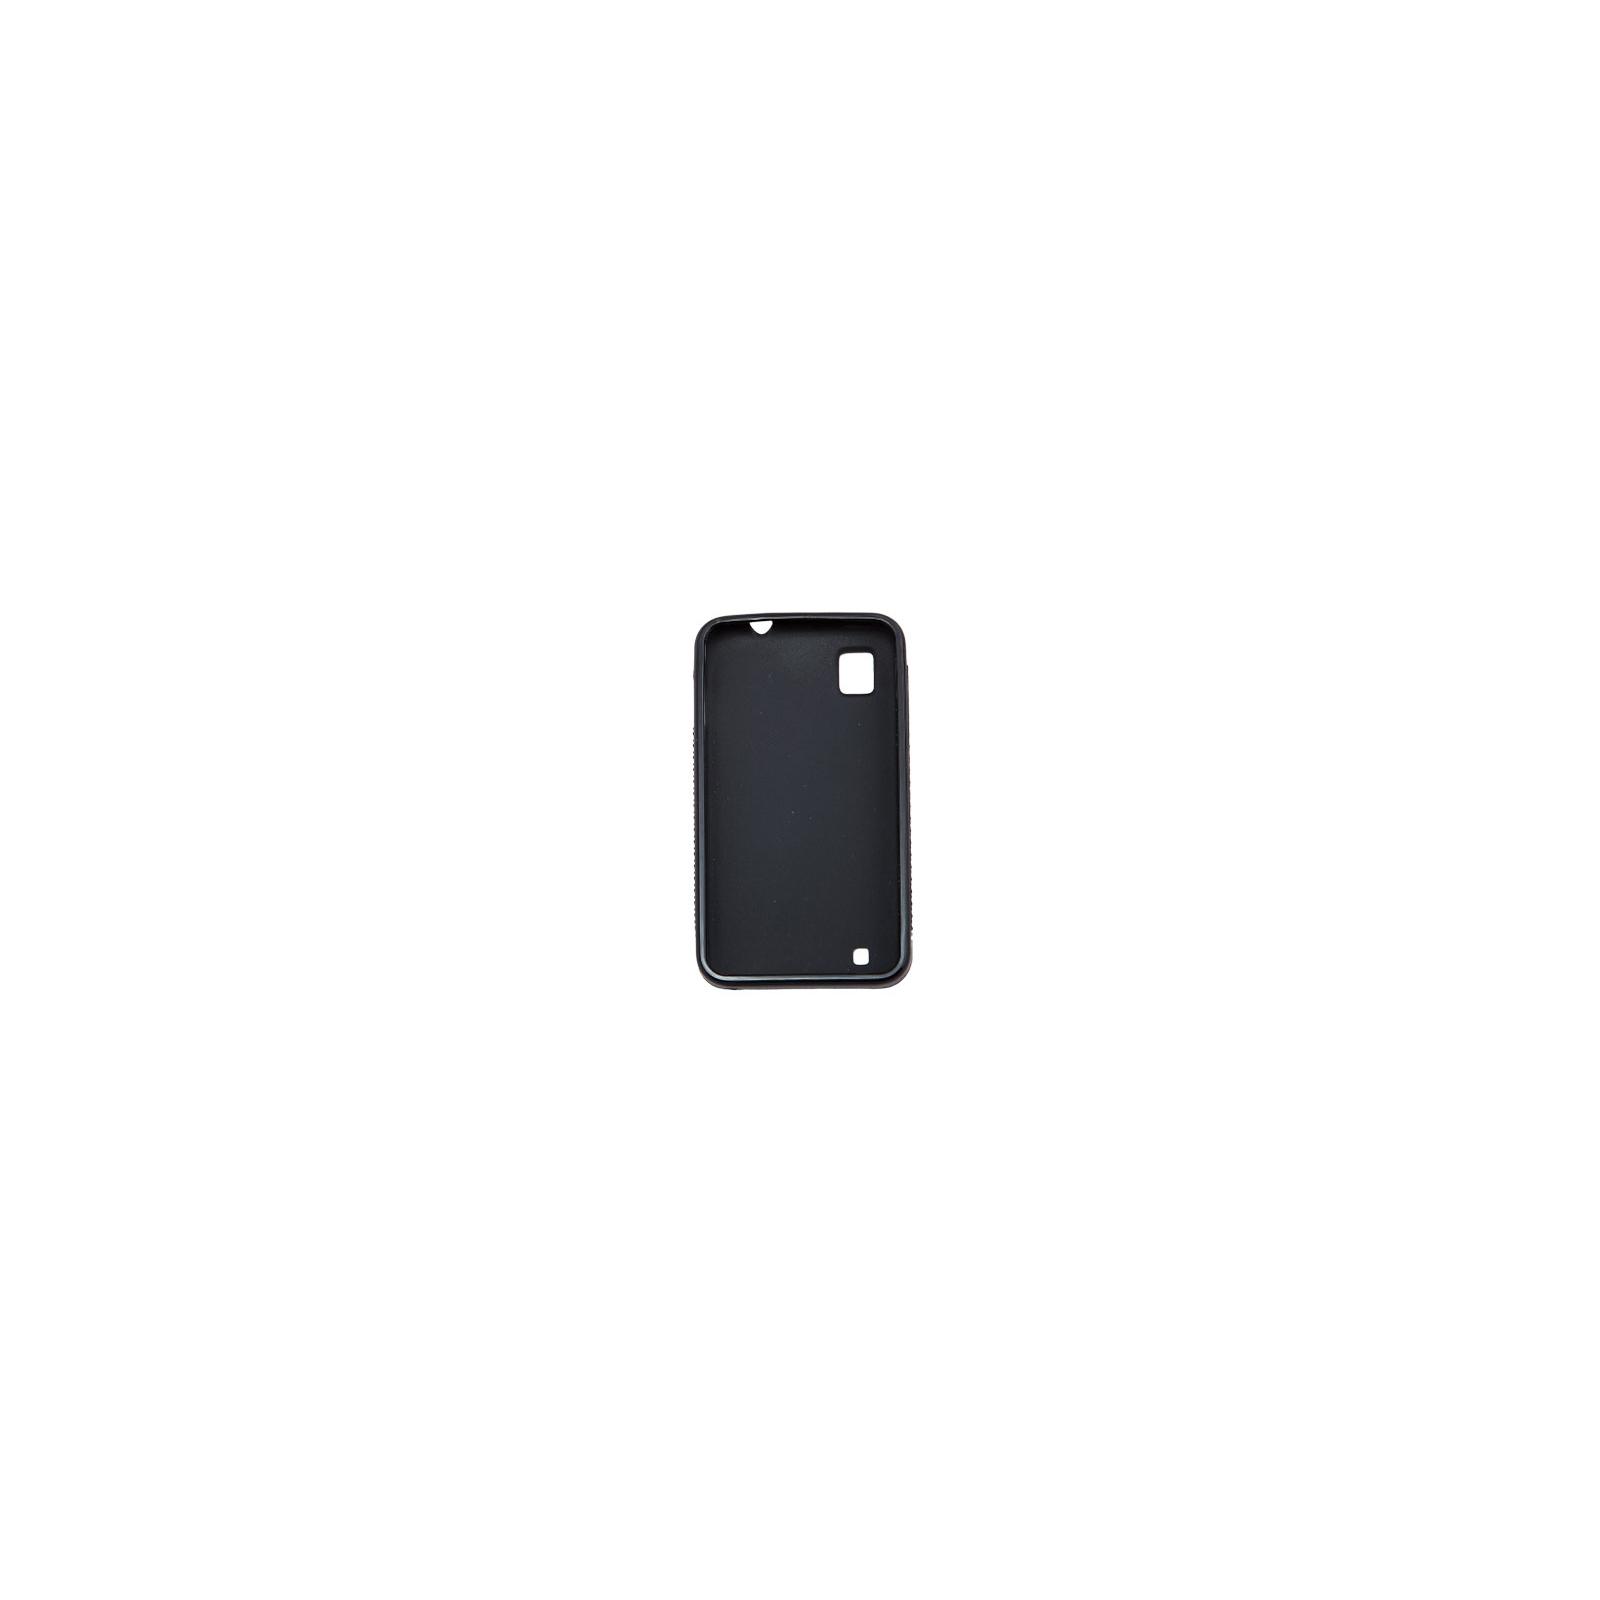 Чехол для моб. телефона для ZTE V880E (Black) Elastic PU Drobak (219020) изображение 2